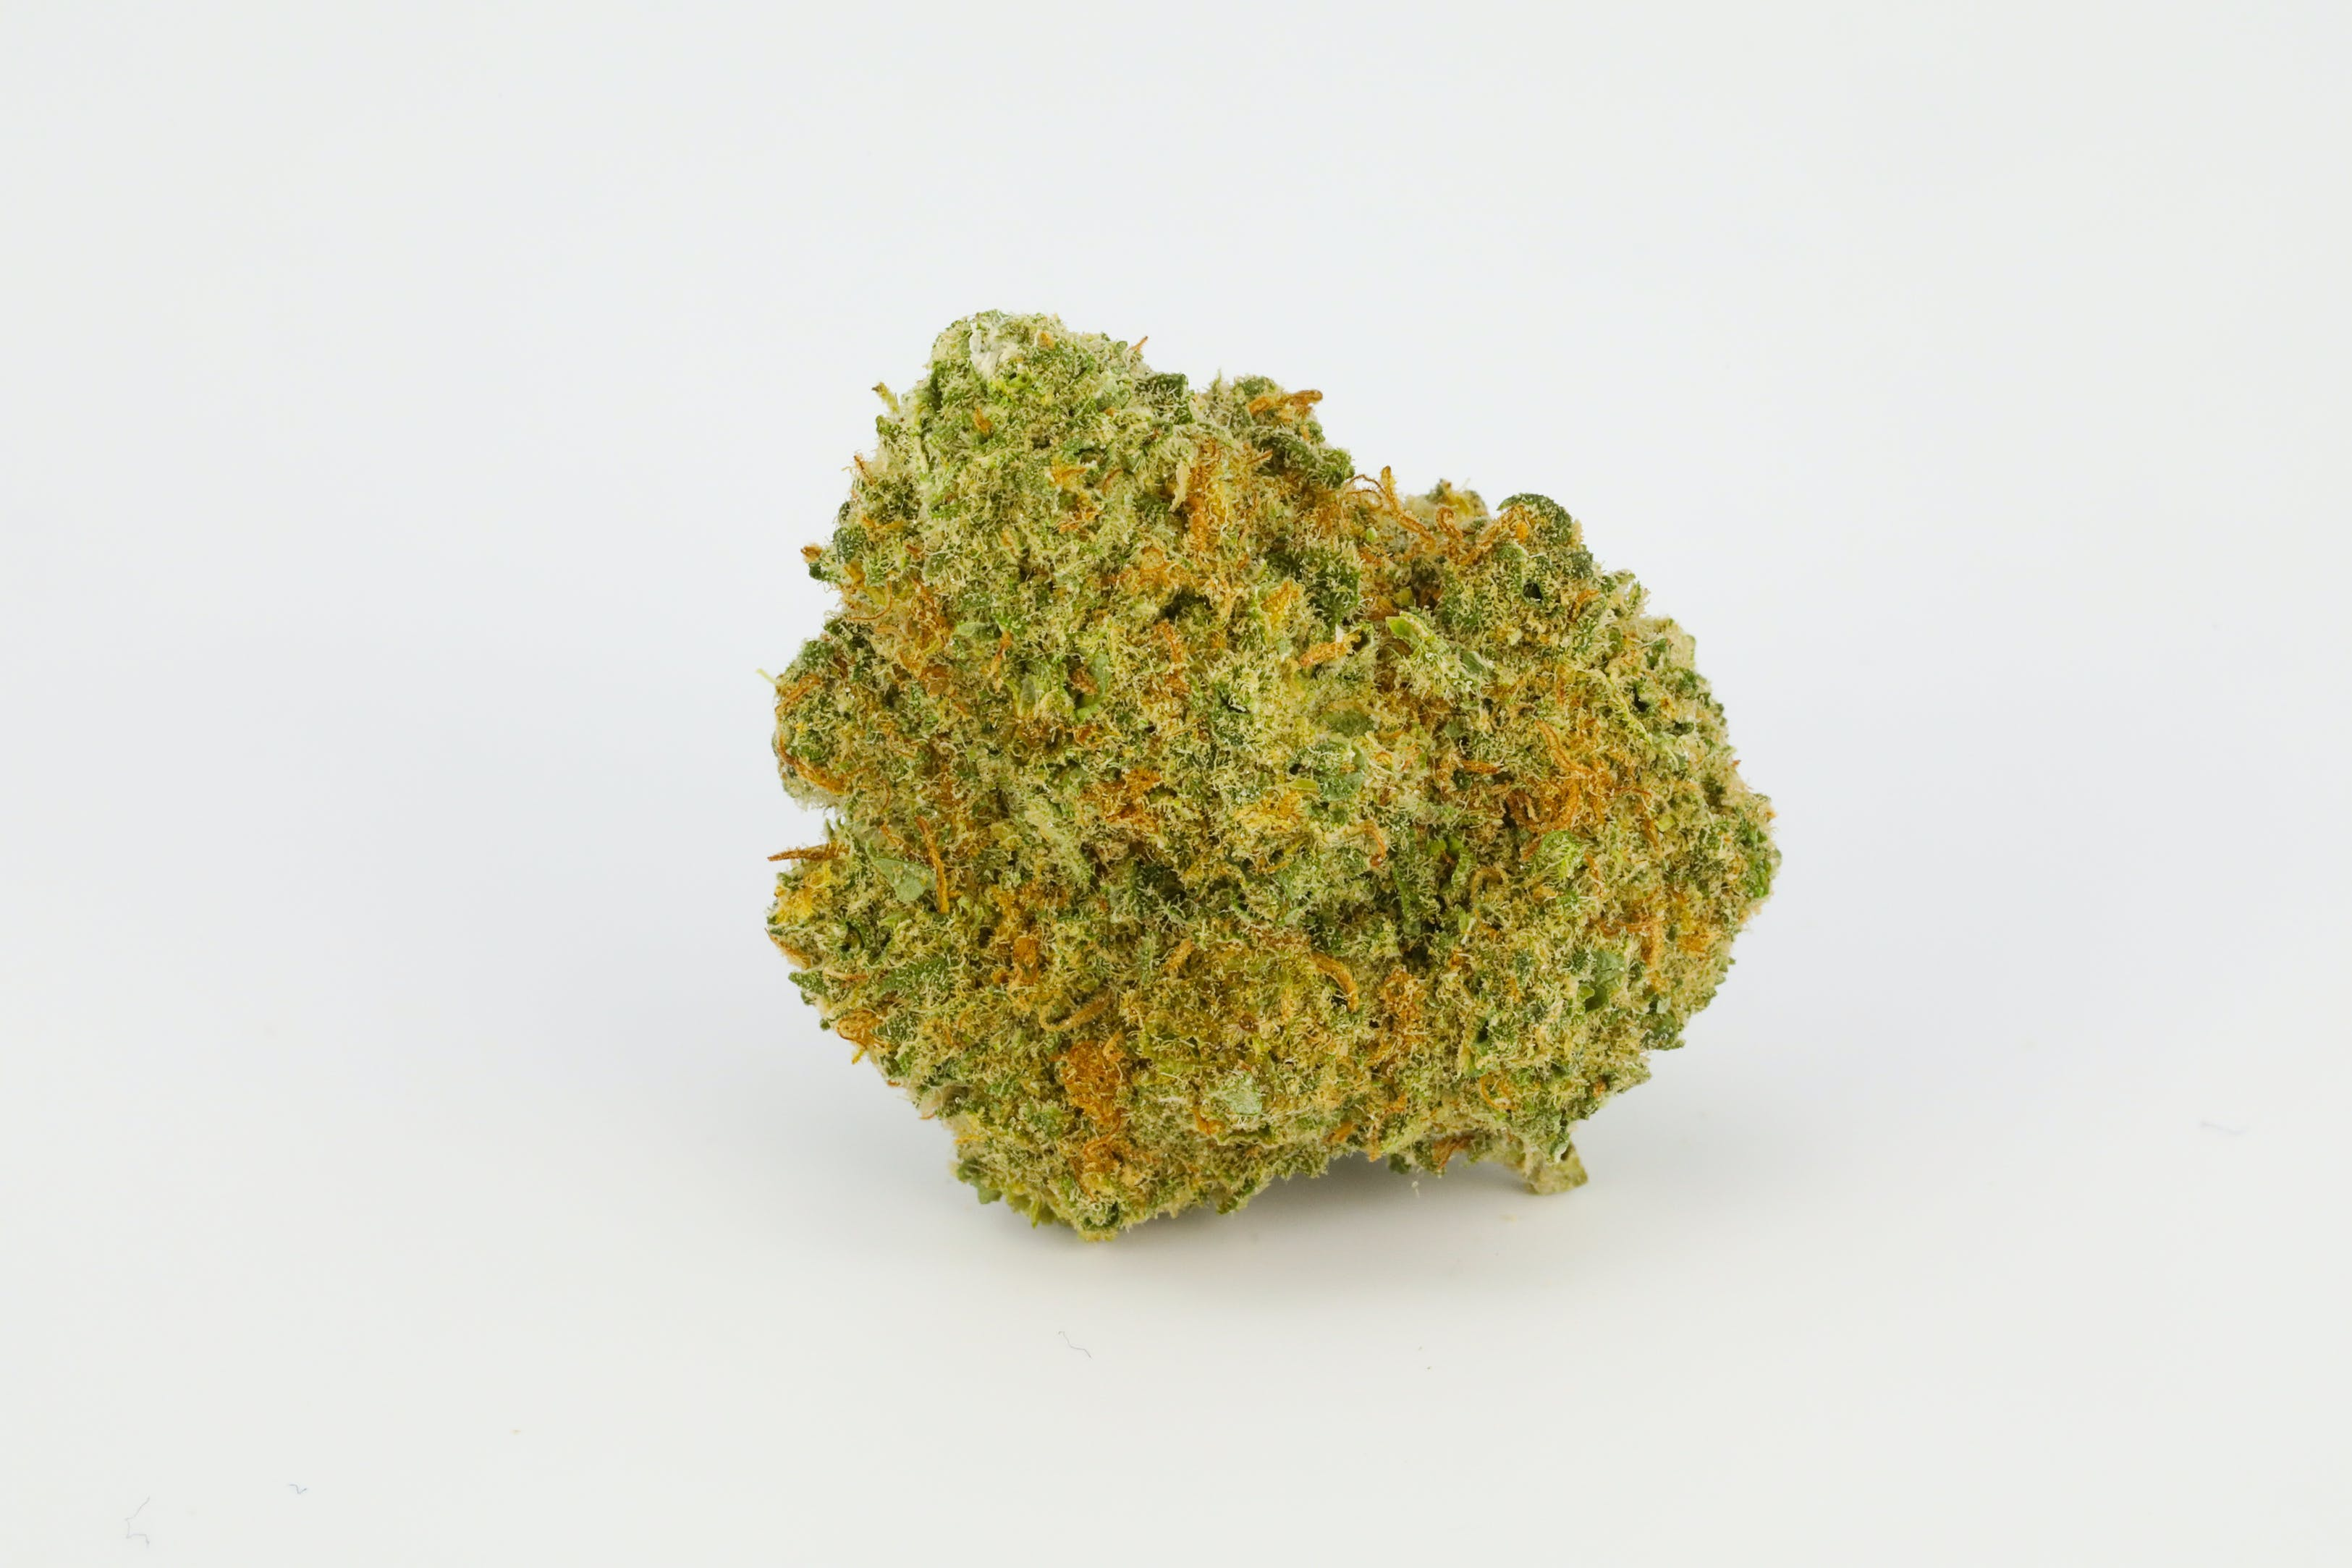 Lemon Alien Dawg Weed; Lemon Alien Dawg Cannabis Strain; Lemon Alien Dawg Hybrid Marijuana Strain